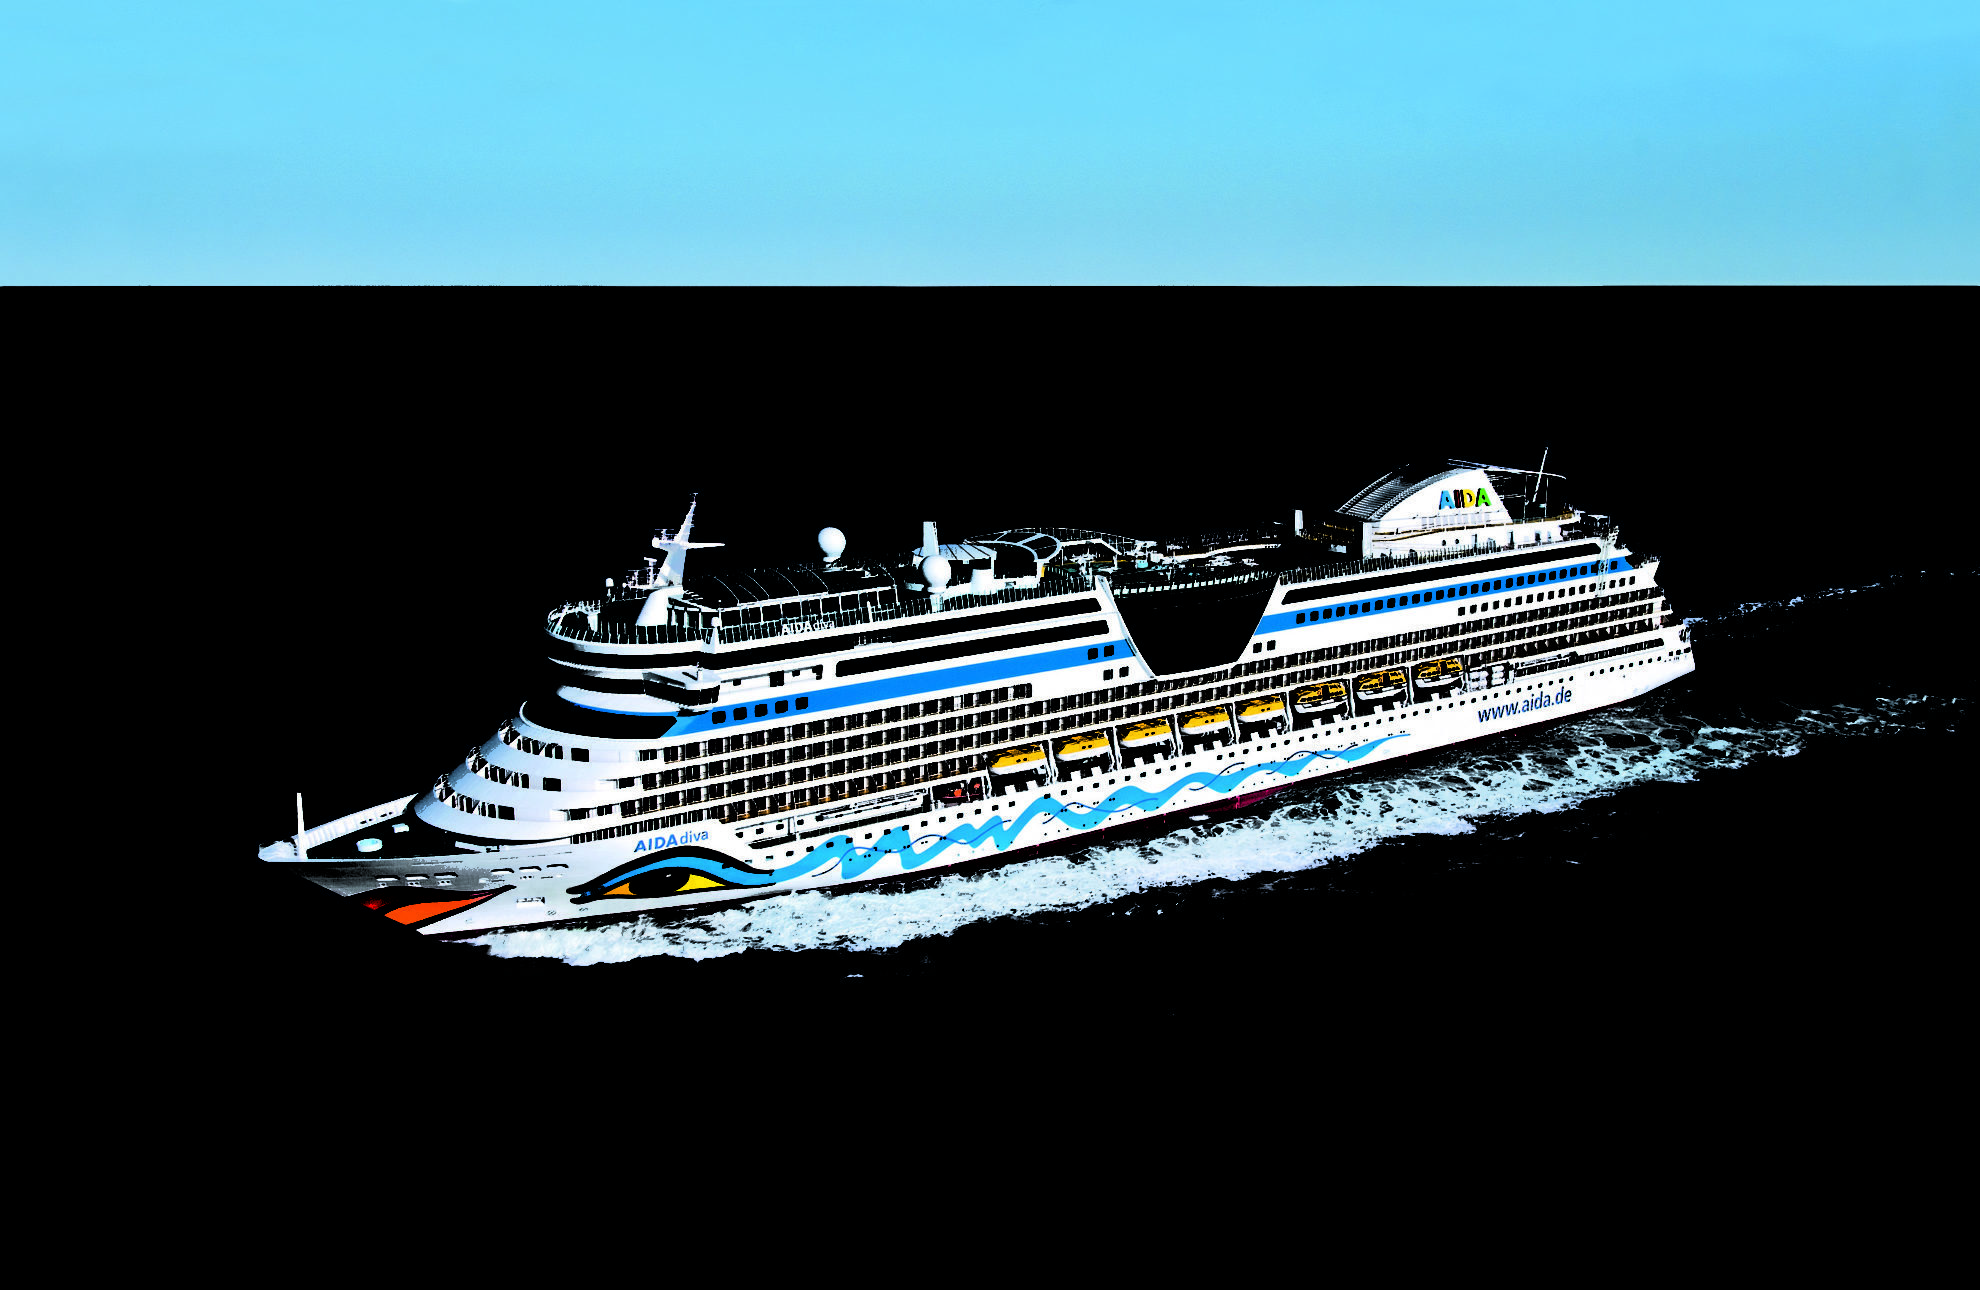 Лайнер AIDA Diva в Северном море.